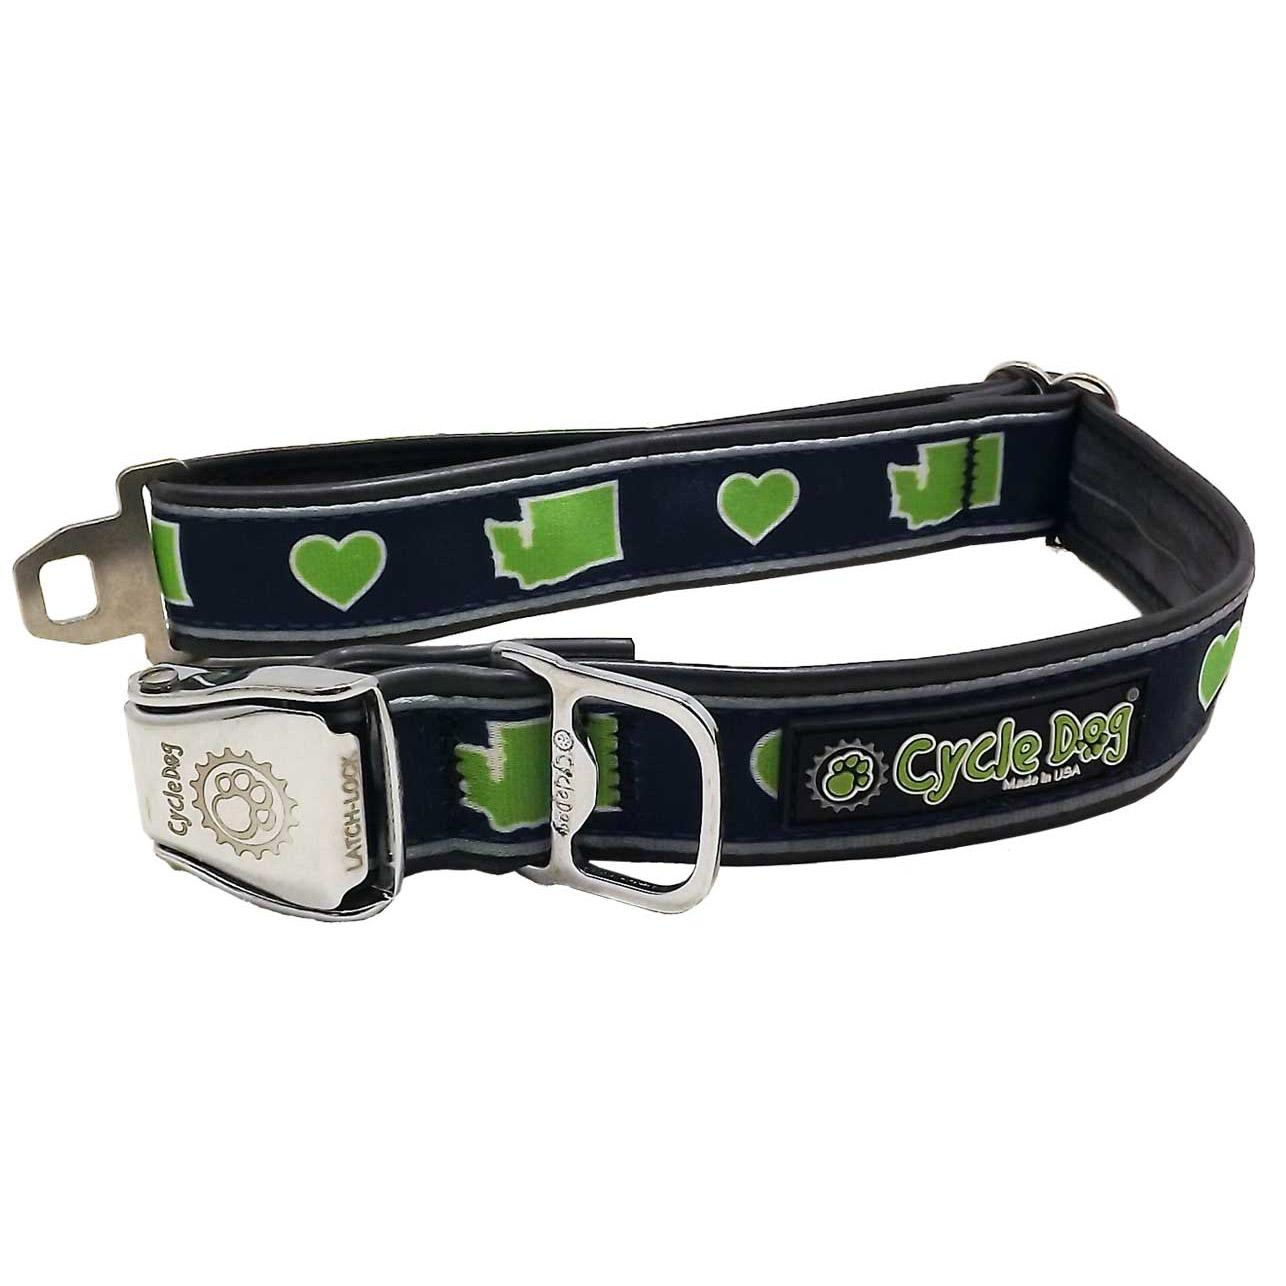 Washington Love Metal Latch Dog Collar by Cycle Dog